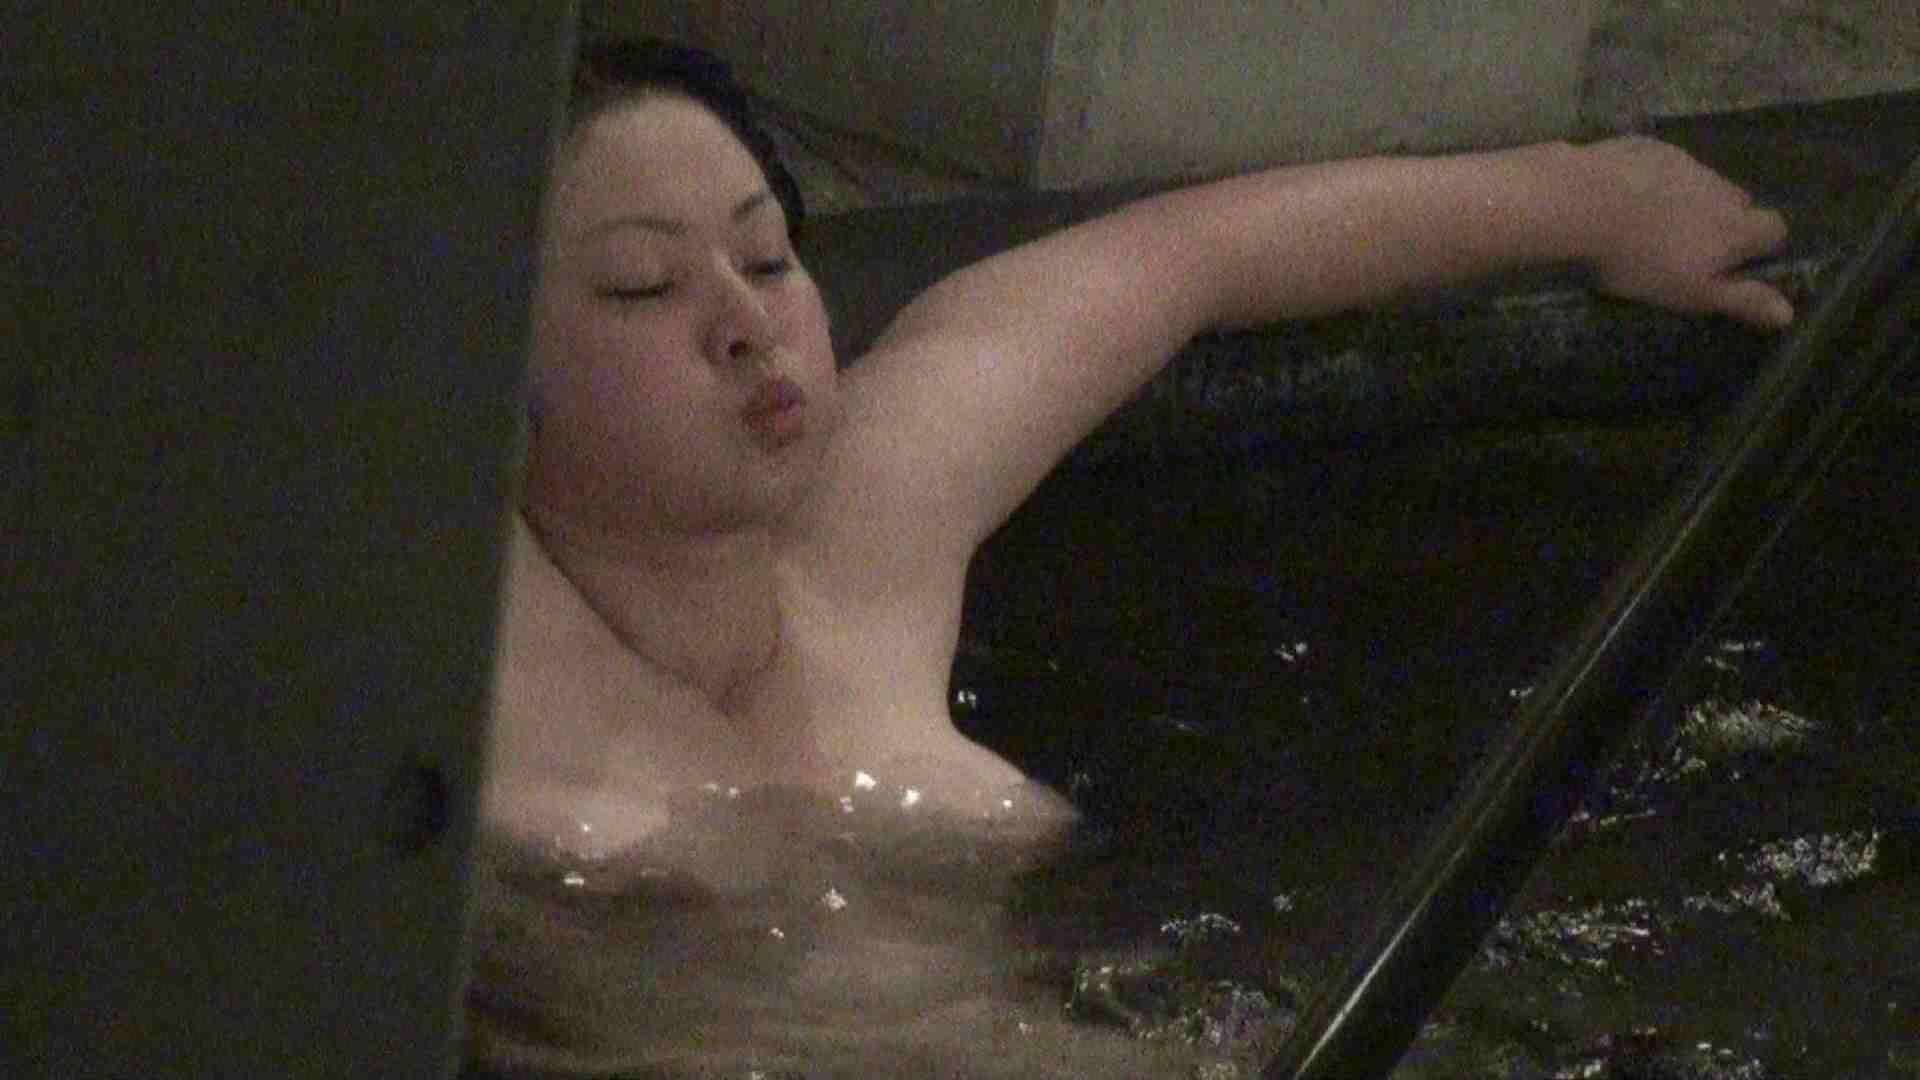 Aquaな露天風呂Vol.338 露天風呂編 | 盗撮シリーズ  82PIX 61